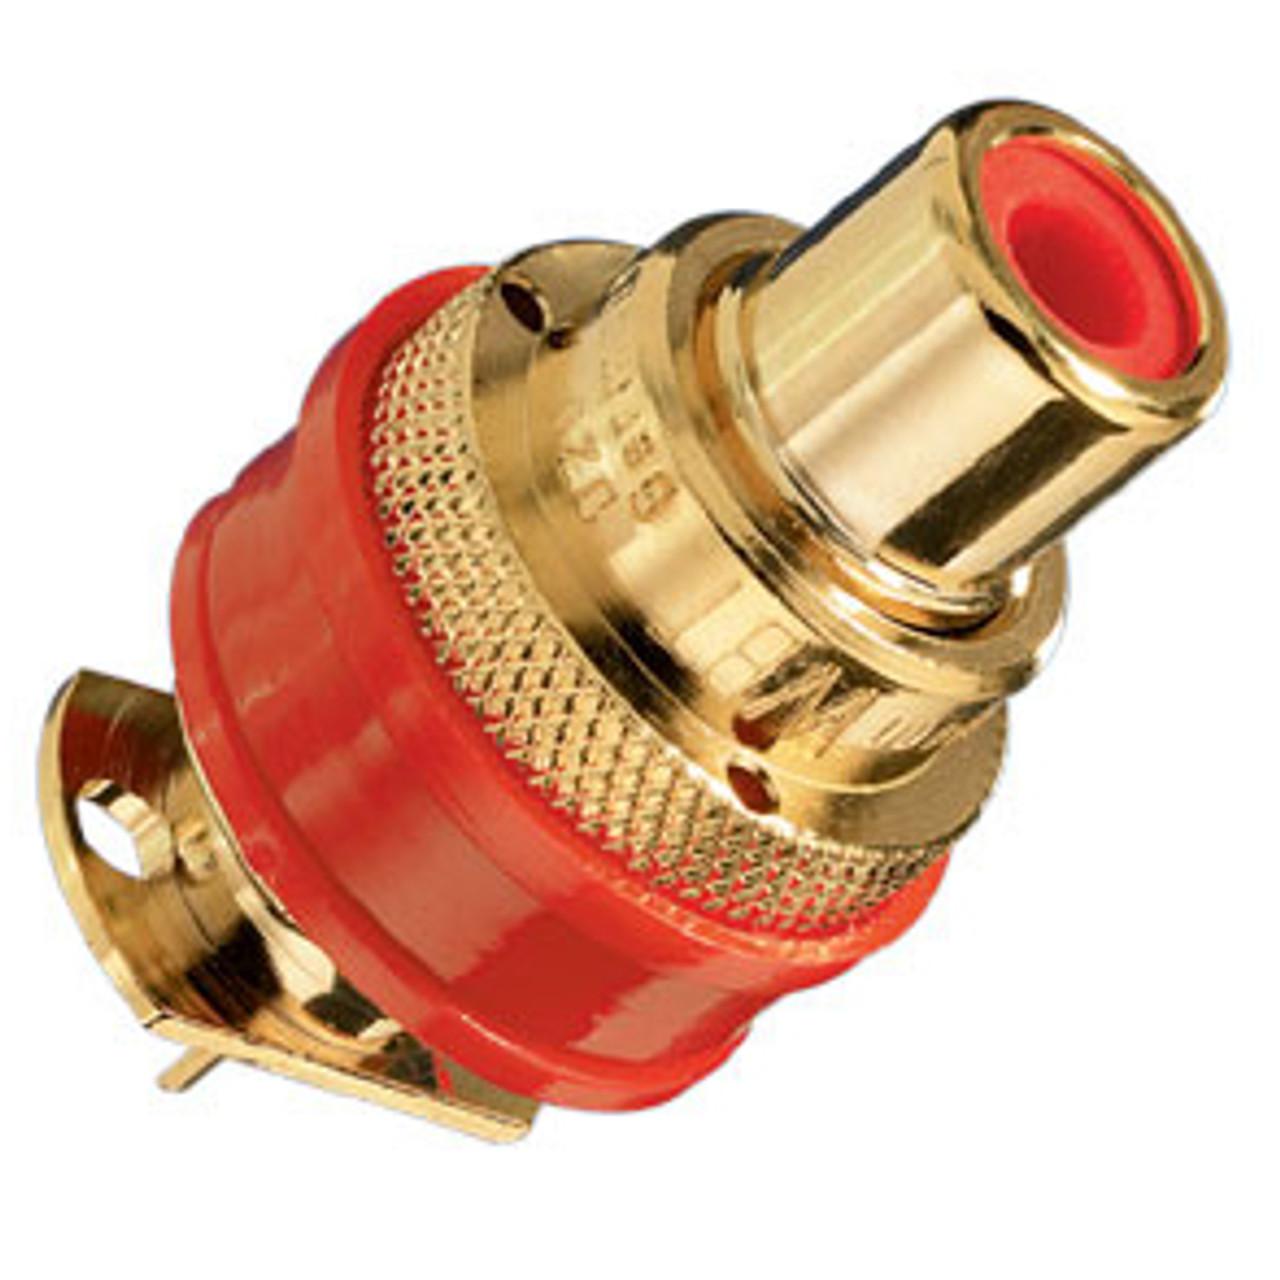 WBT WBT-0201 Cu RCA socket